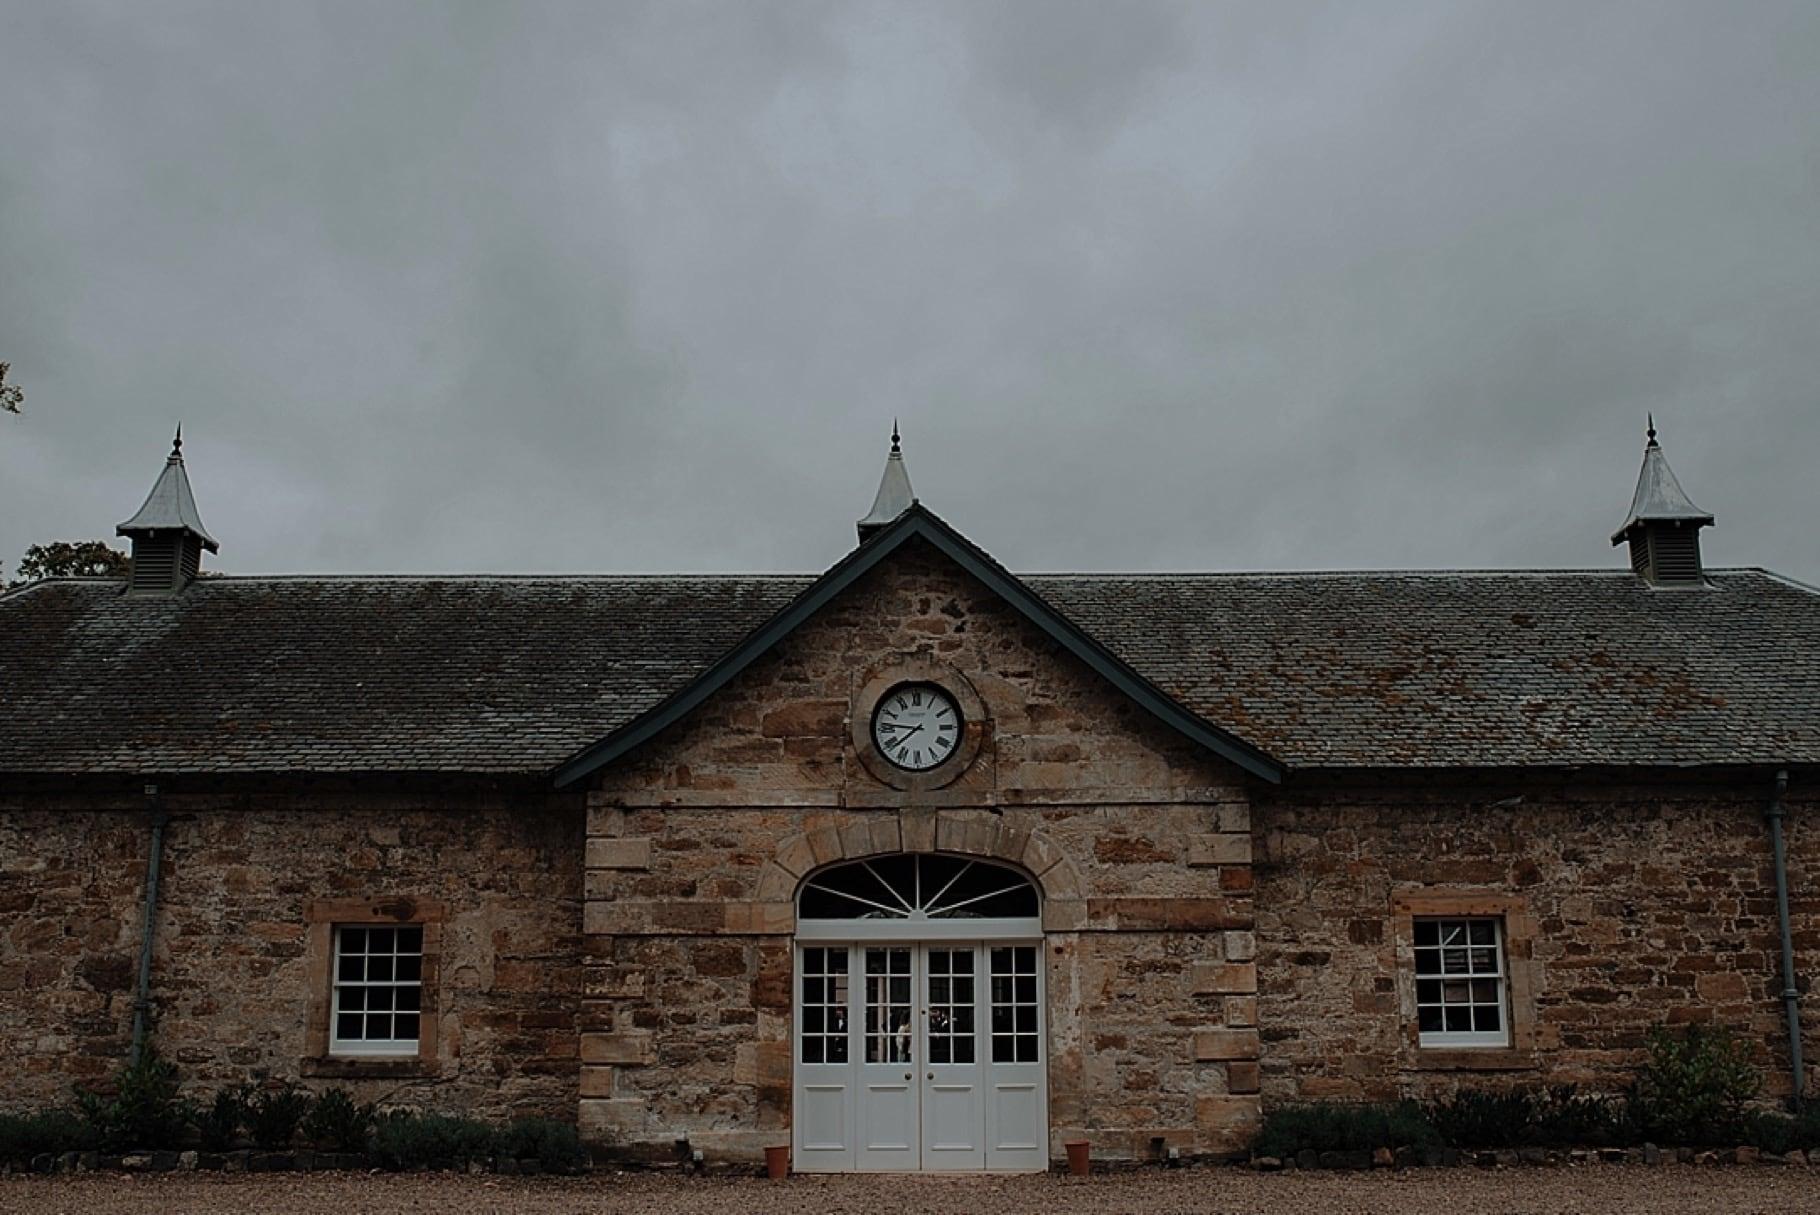 Colstoun House coachhouse